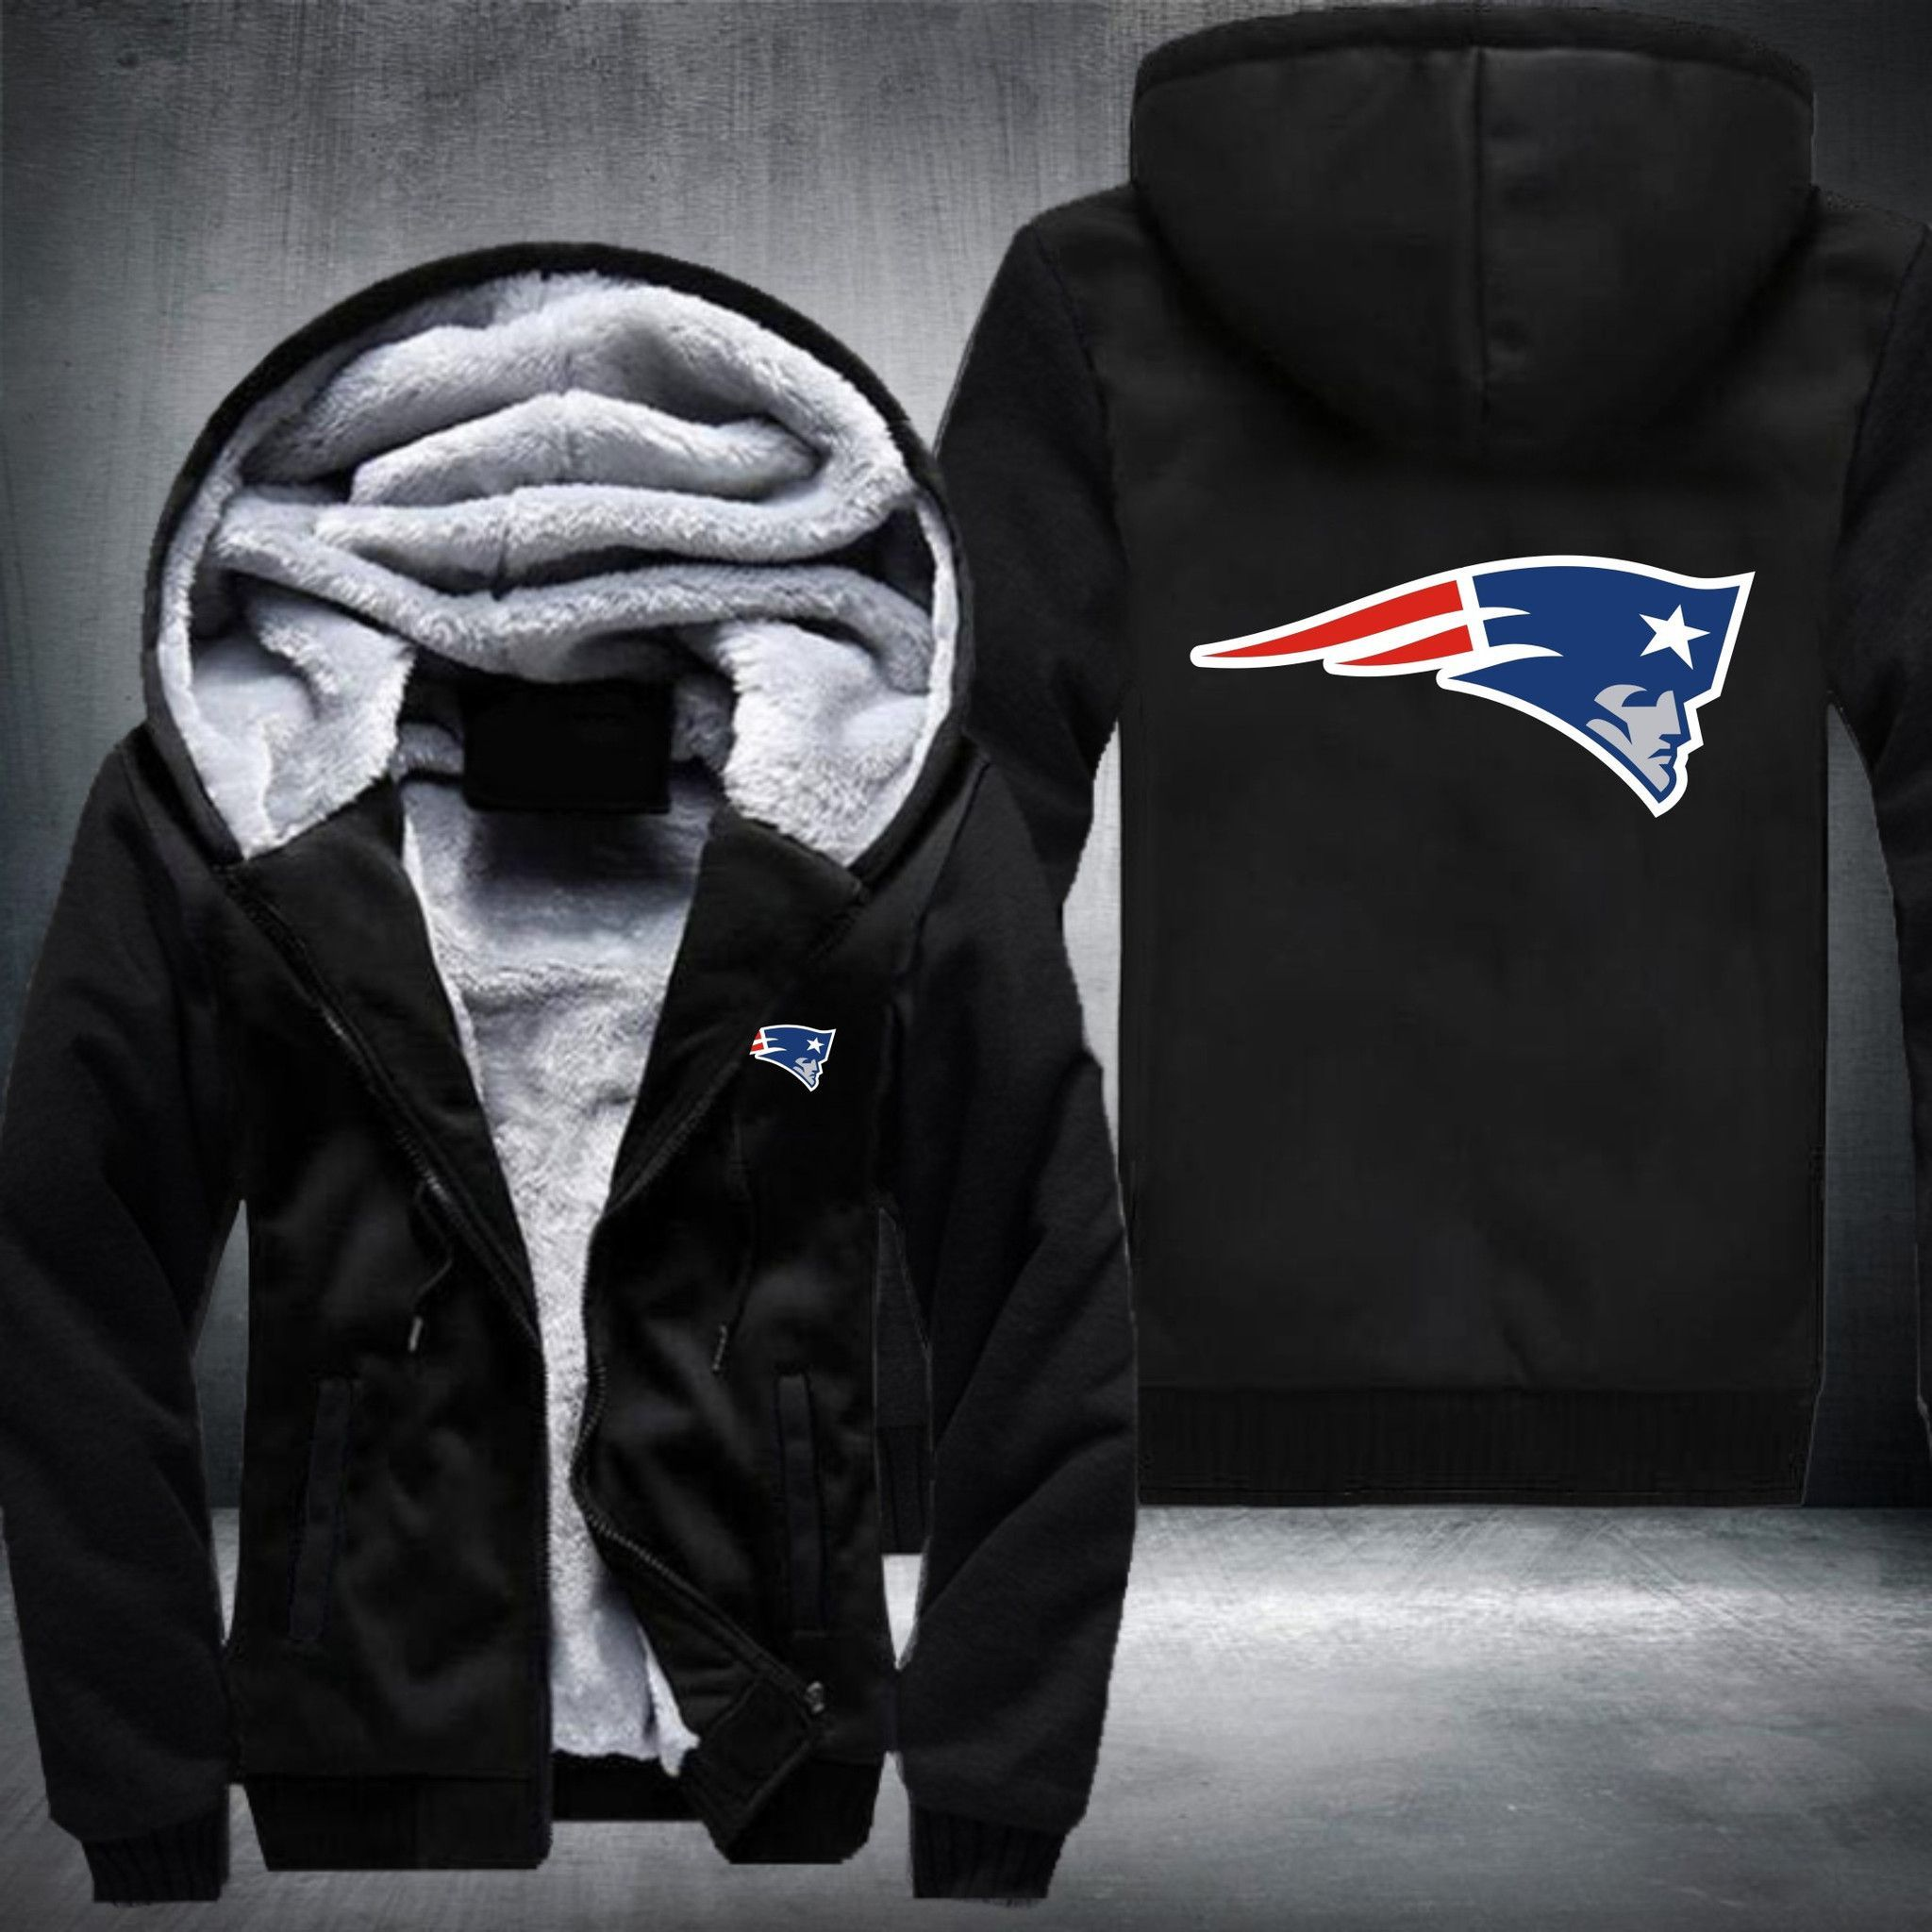 Nfl New England Patriots Big Logo Thick Fleece Jacket New England Patriots Nfl New England Patriots Fleece Jacket